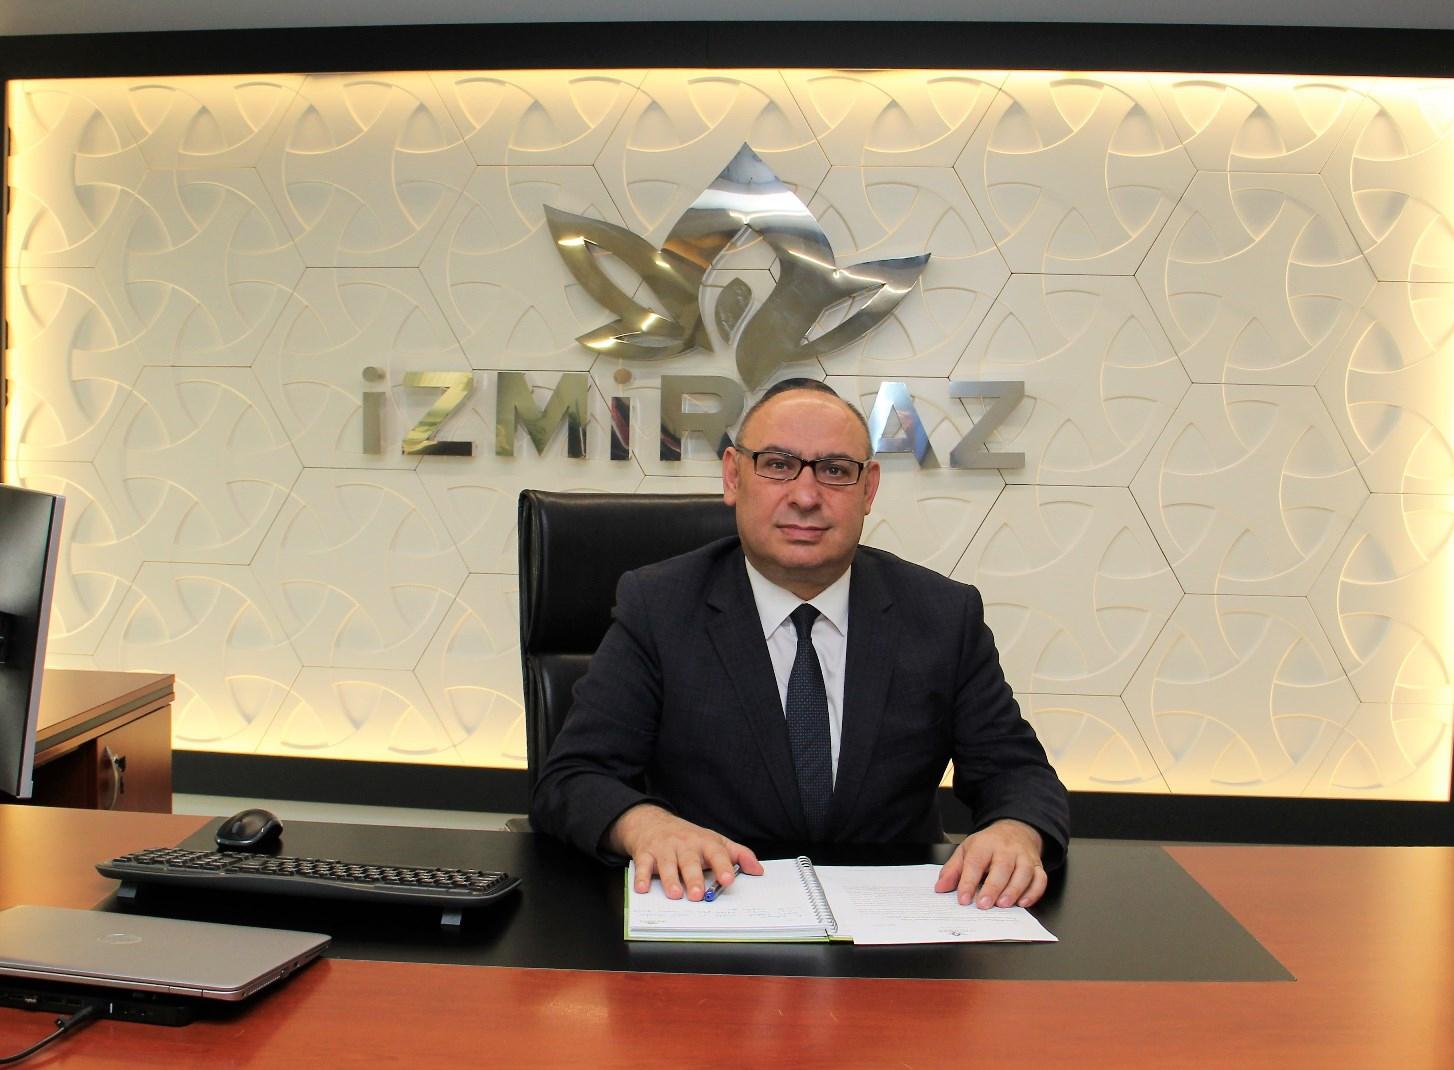 İzmir Doğal Gaz'dan Yeni Foça'ya yatırım